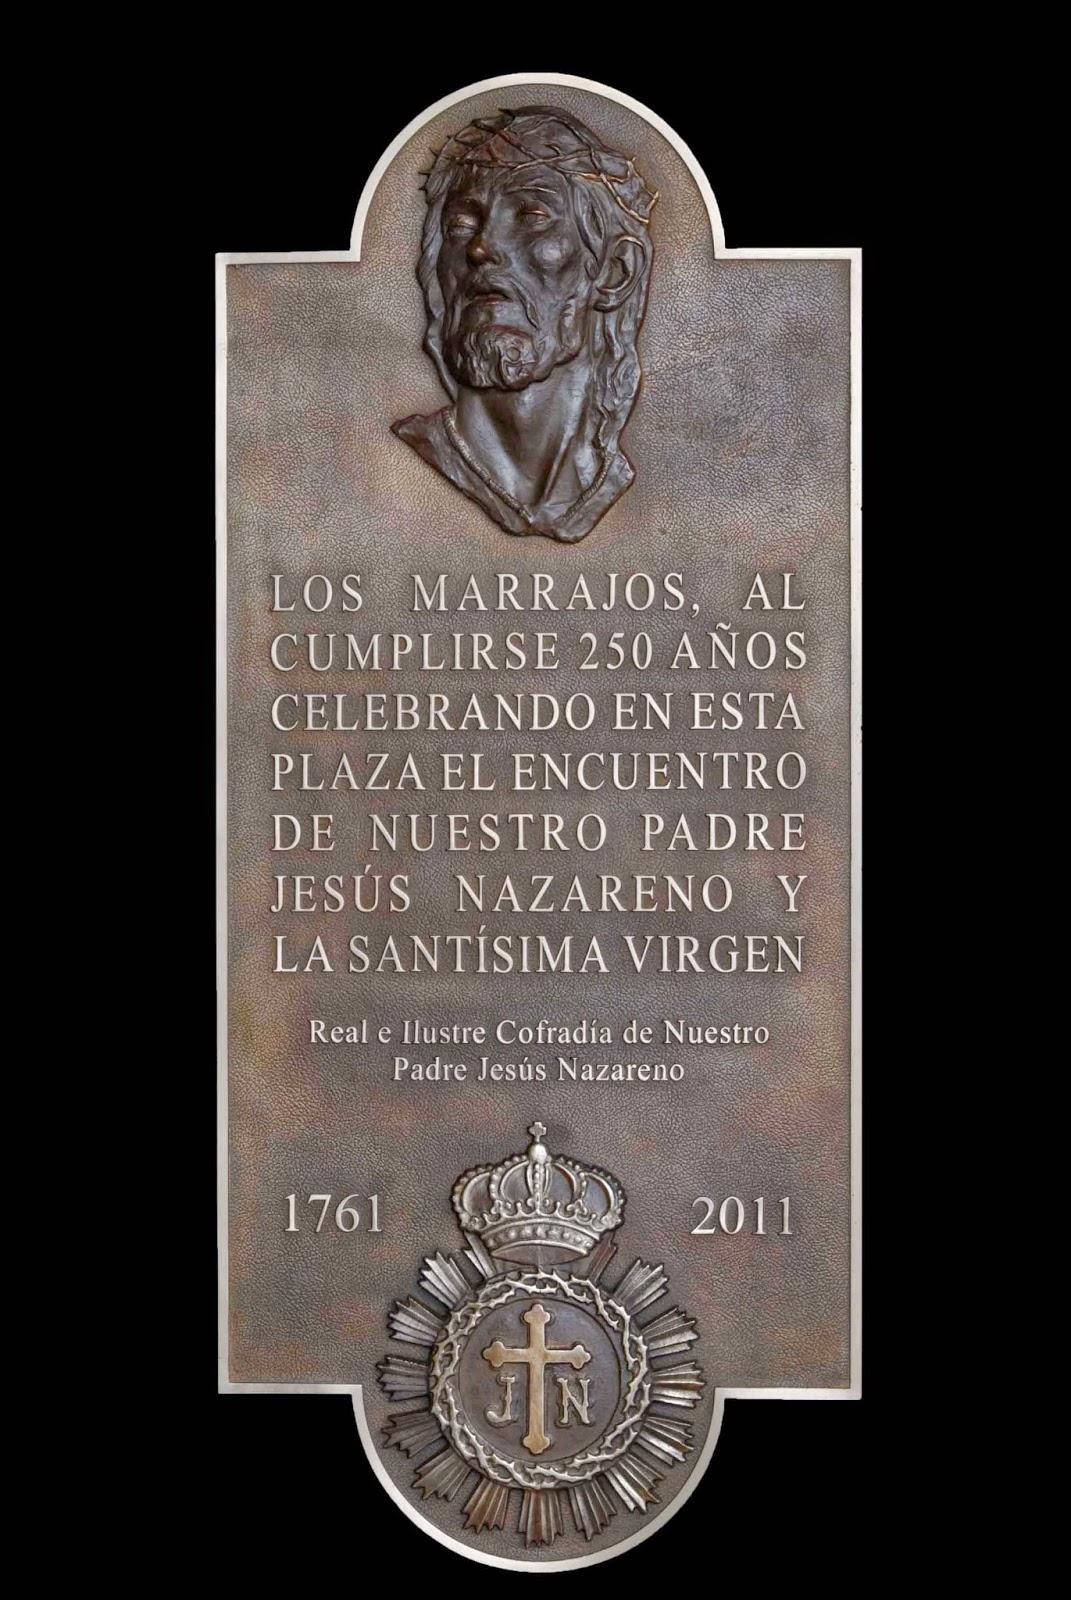 Placa Marraja bronce Cartagena Murcia Arturo Serra escultura 1